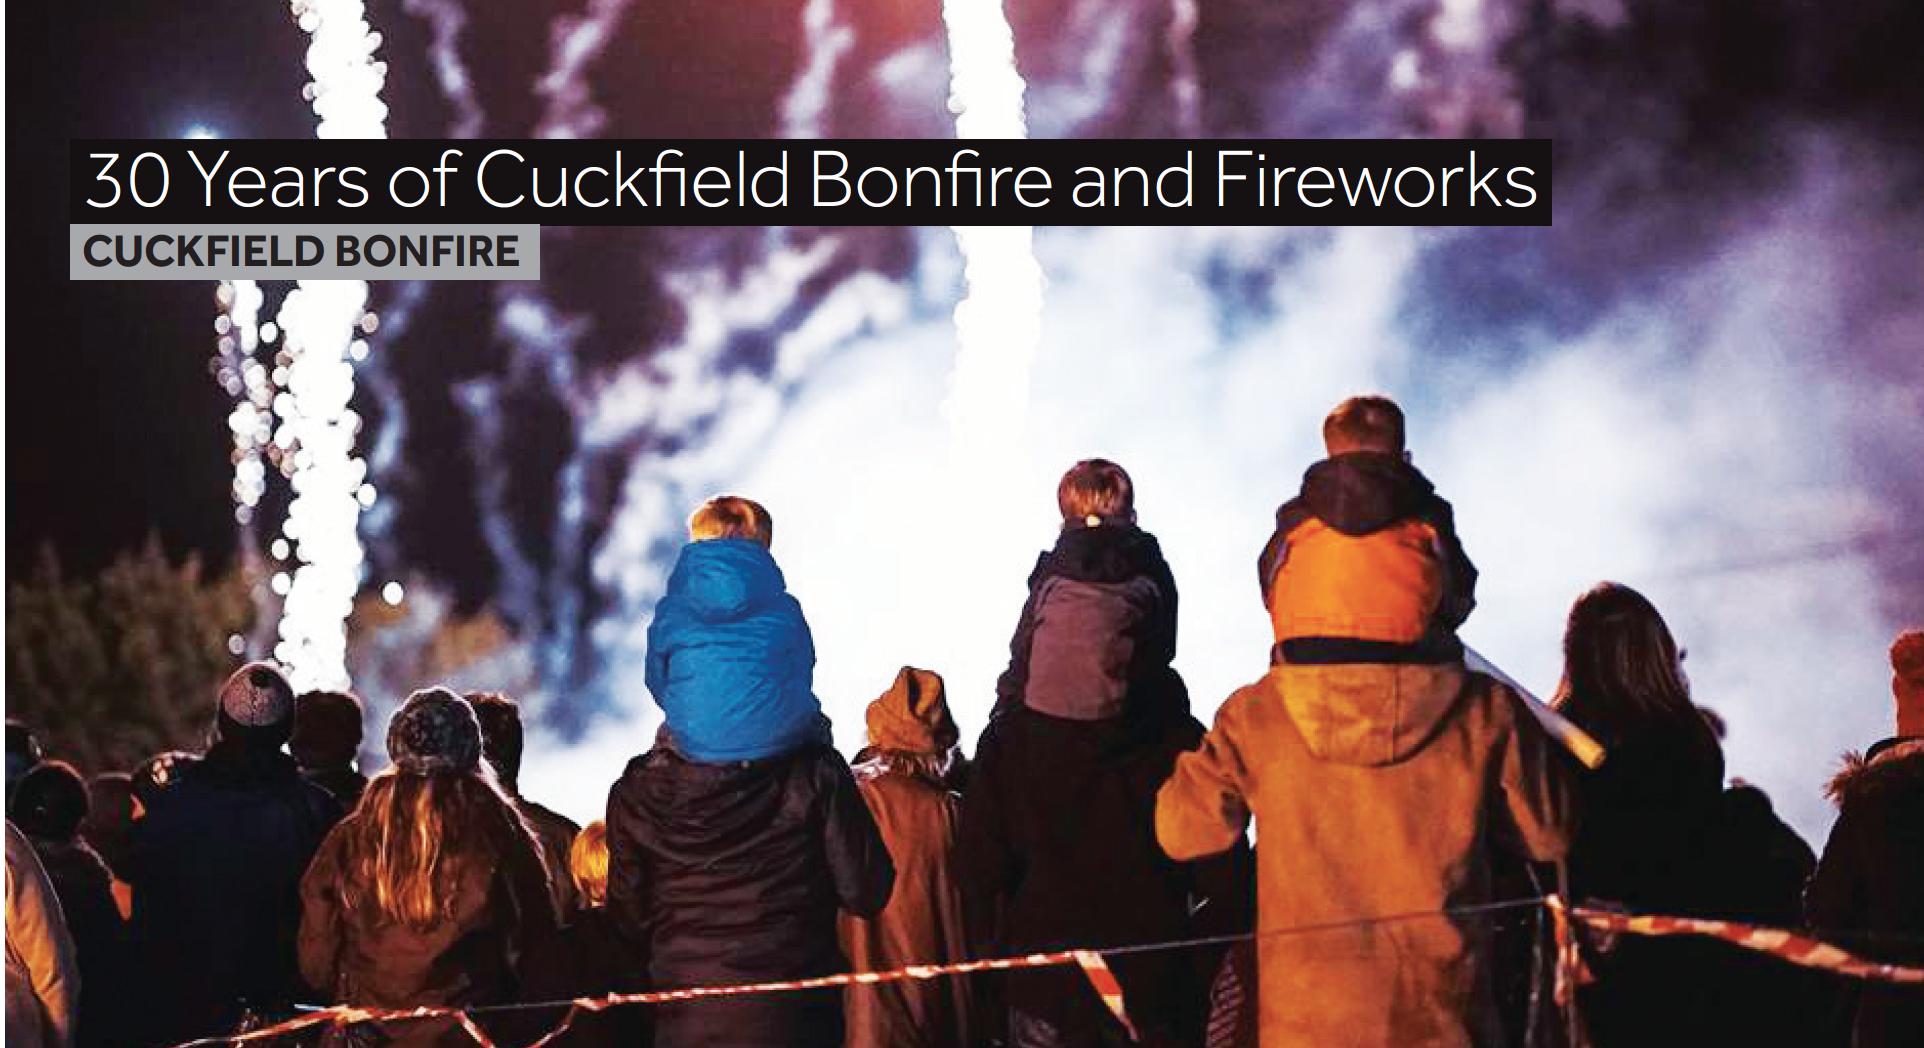 Cuckfield Bonfire 2016